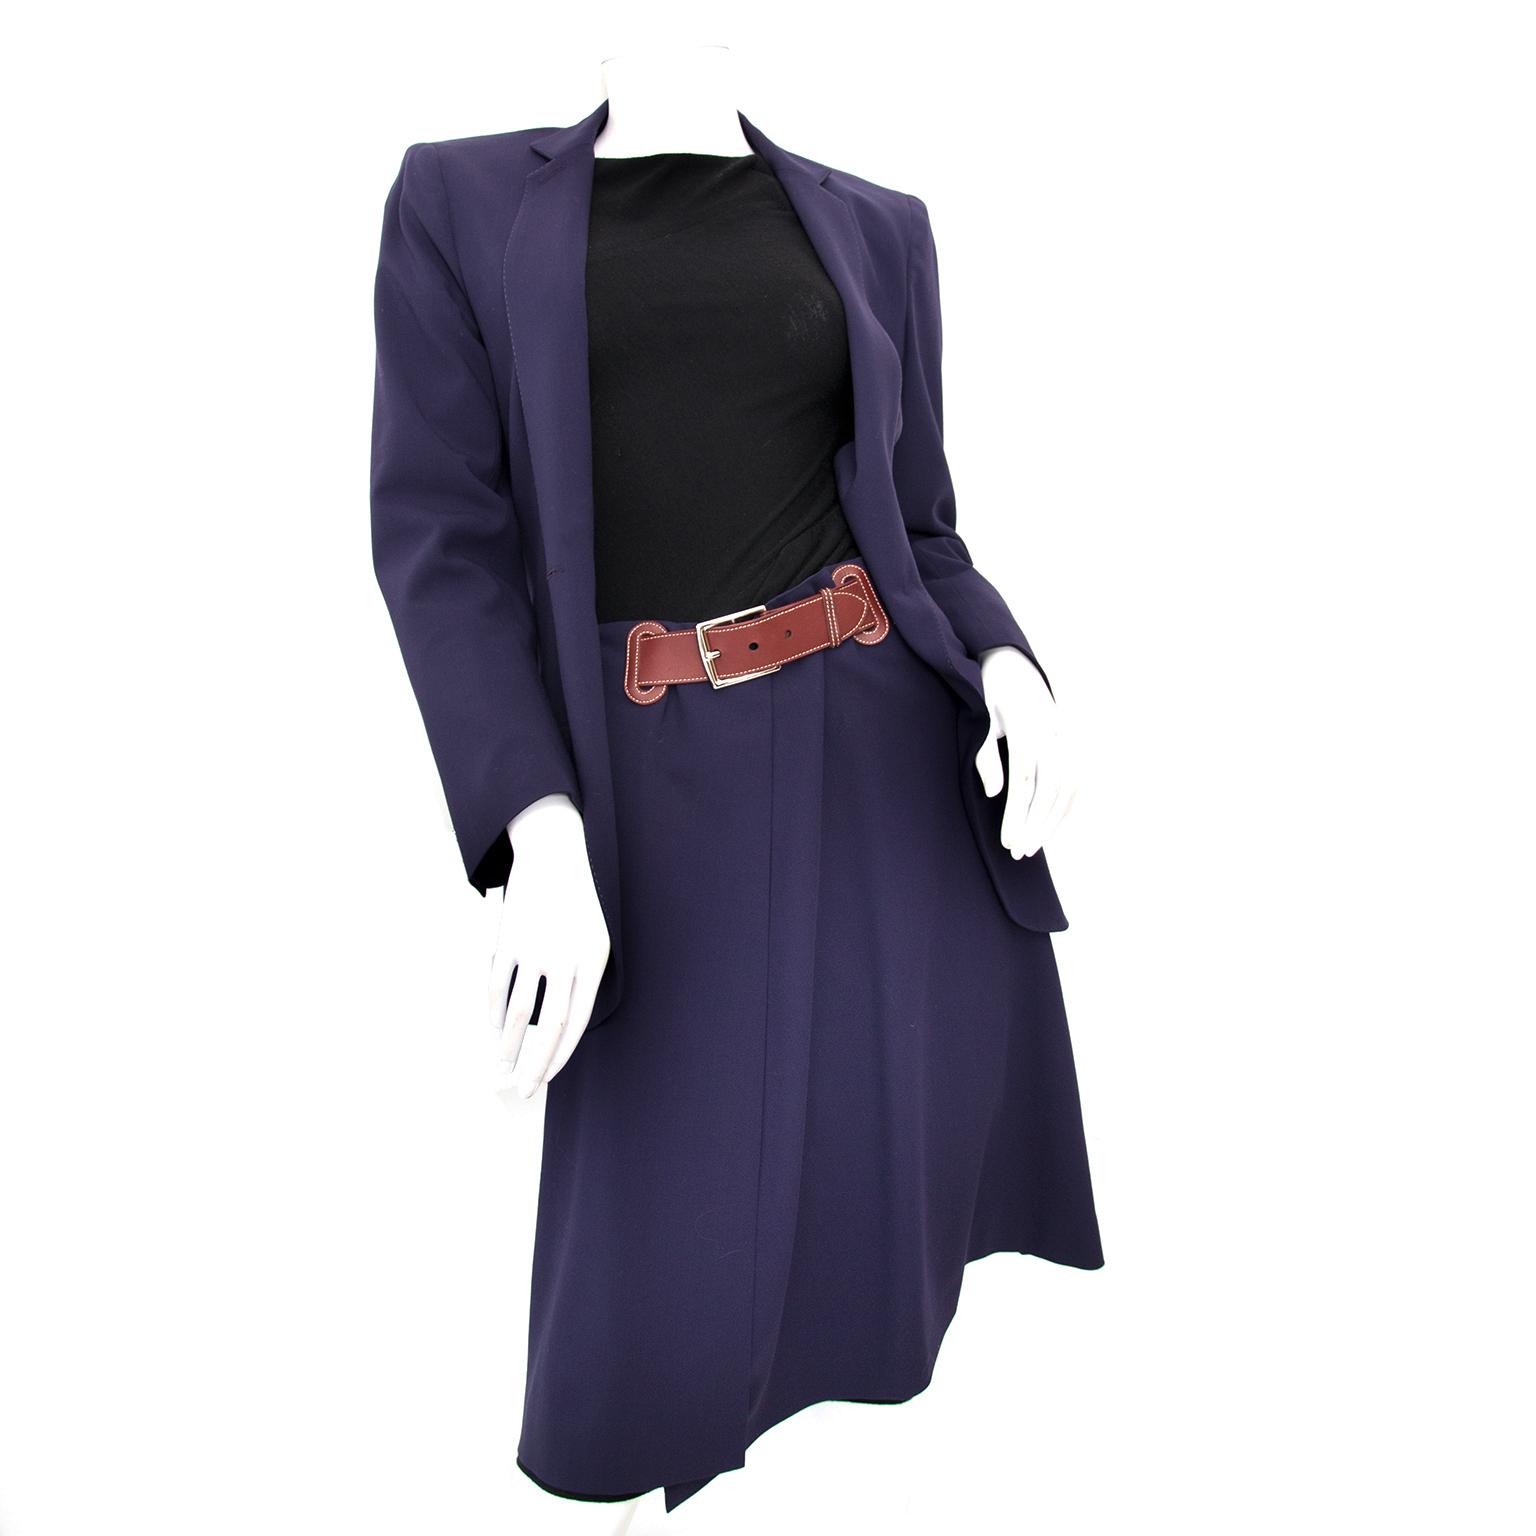 shop safe online as new Hermes Wool Blue Jacket Pencil Skirt Suit